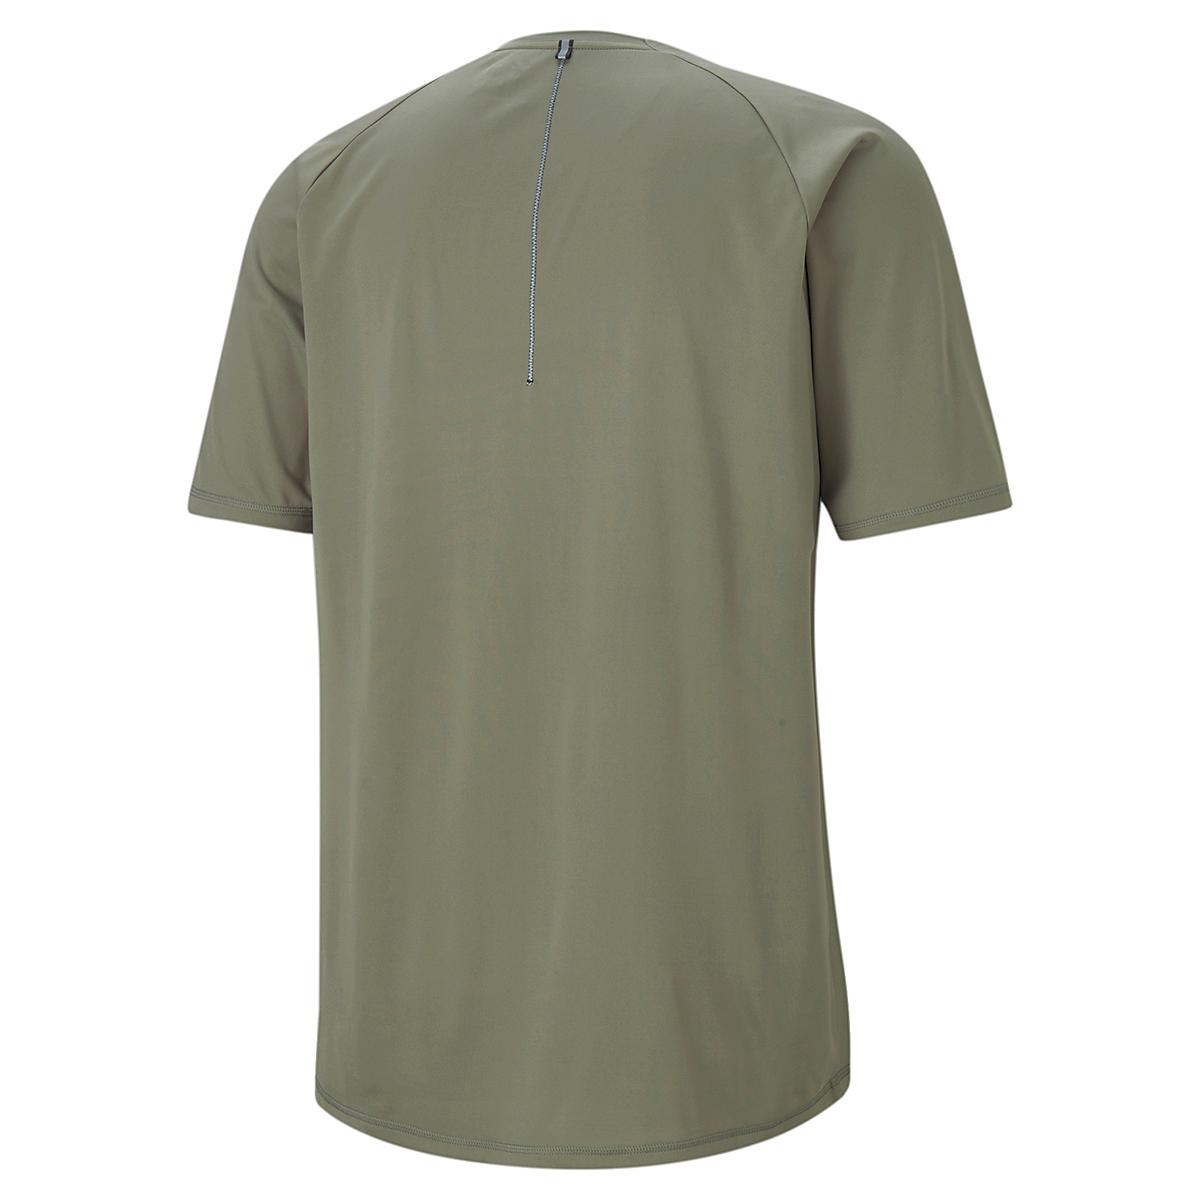 Men's Puma Run Lite COOLadapt Short Sleeve Tee - Color: Vetiver - Size: XXS, Vetiver, large, image 3